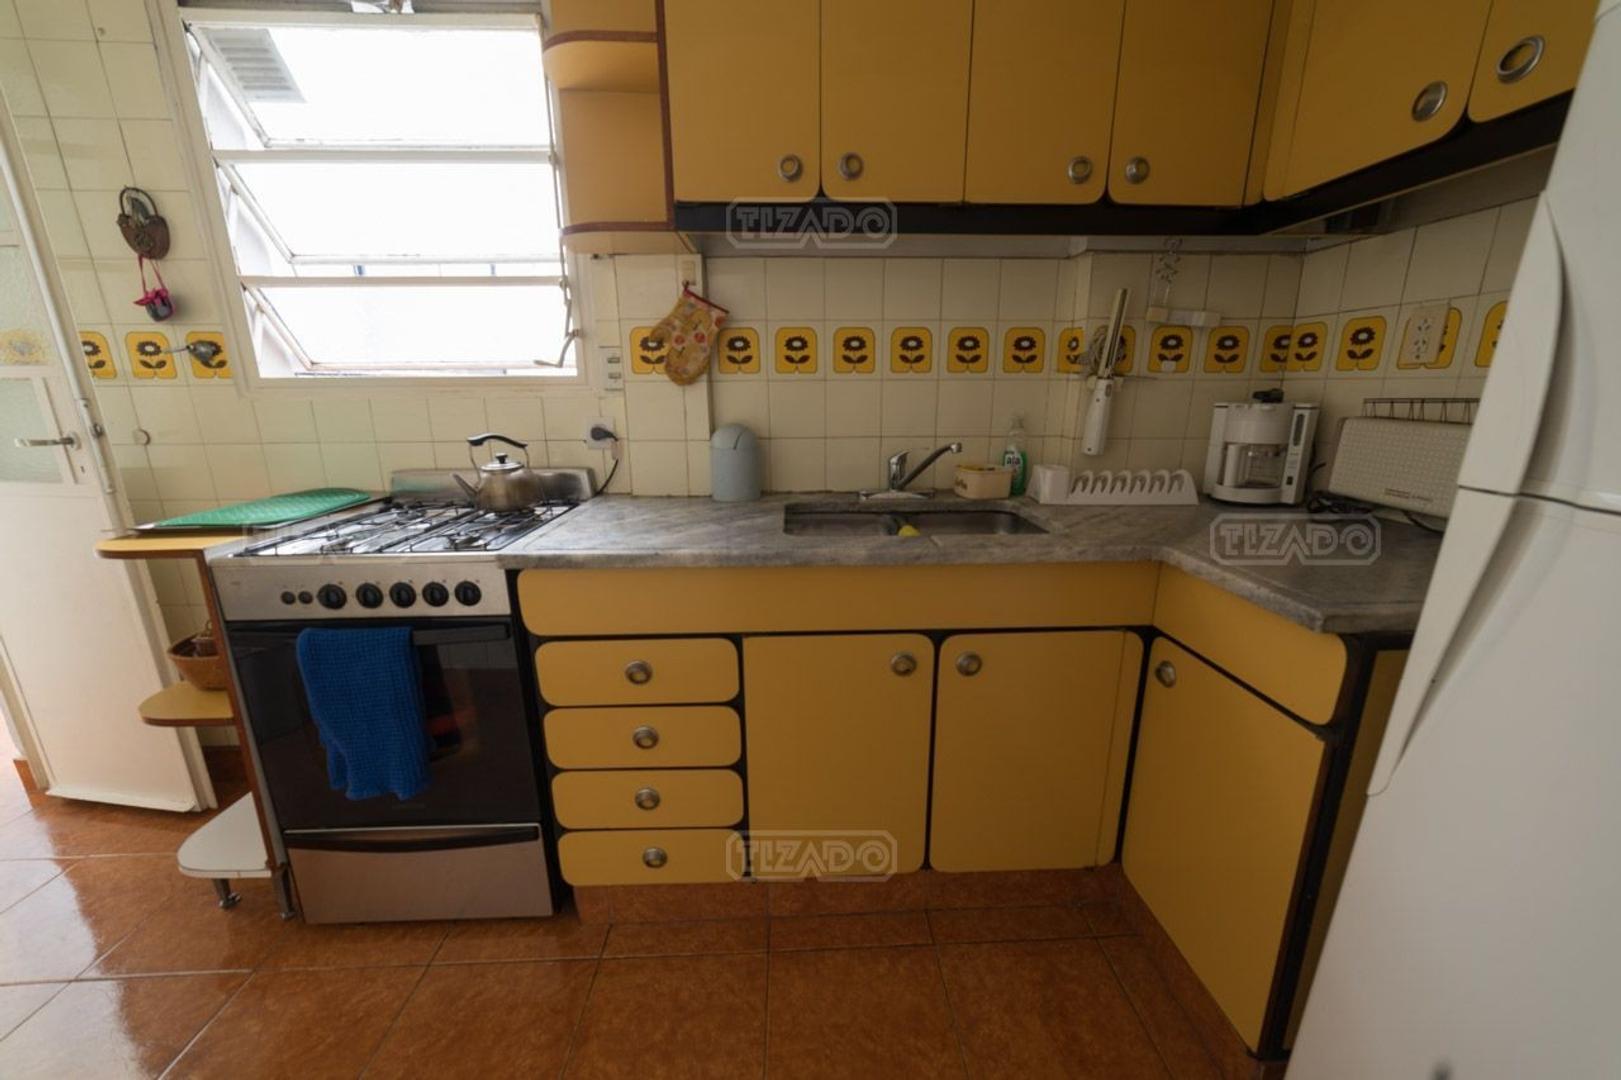 Departamento Semipiso  en Venta ubicado en Caballito, Capital Federal - CAB1303_LP220737_1 - Foto 26